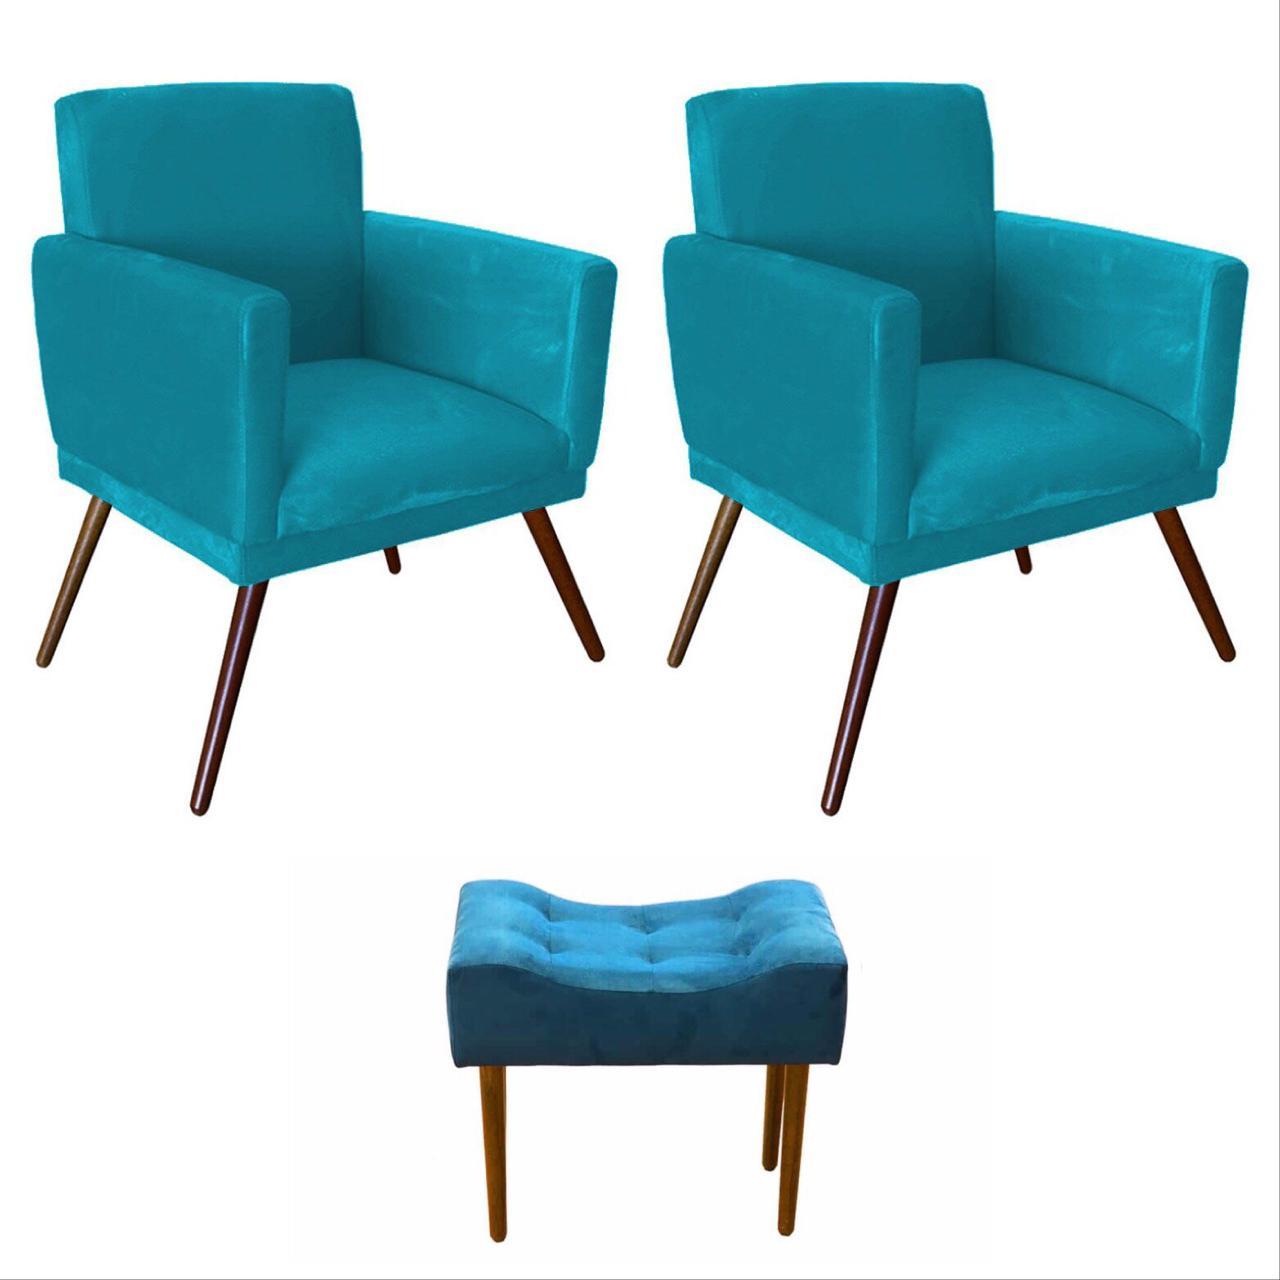 Kit 02 Poltrona Decorativa Nina com rodapé e Puff retangular Azul